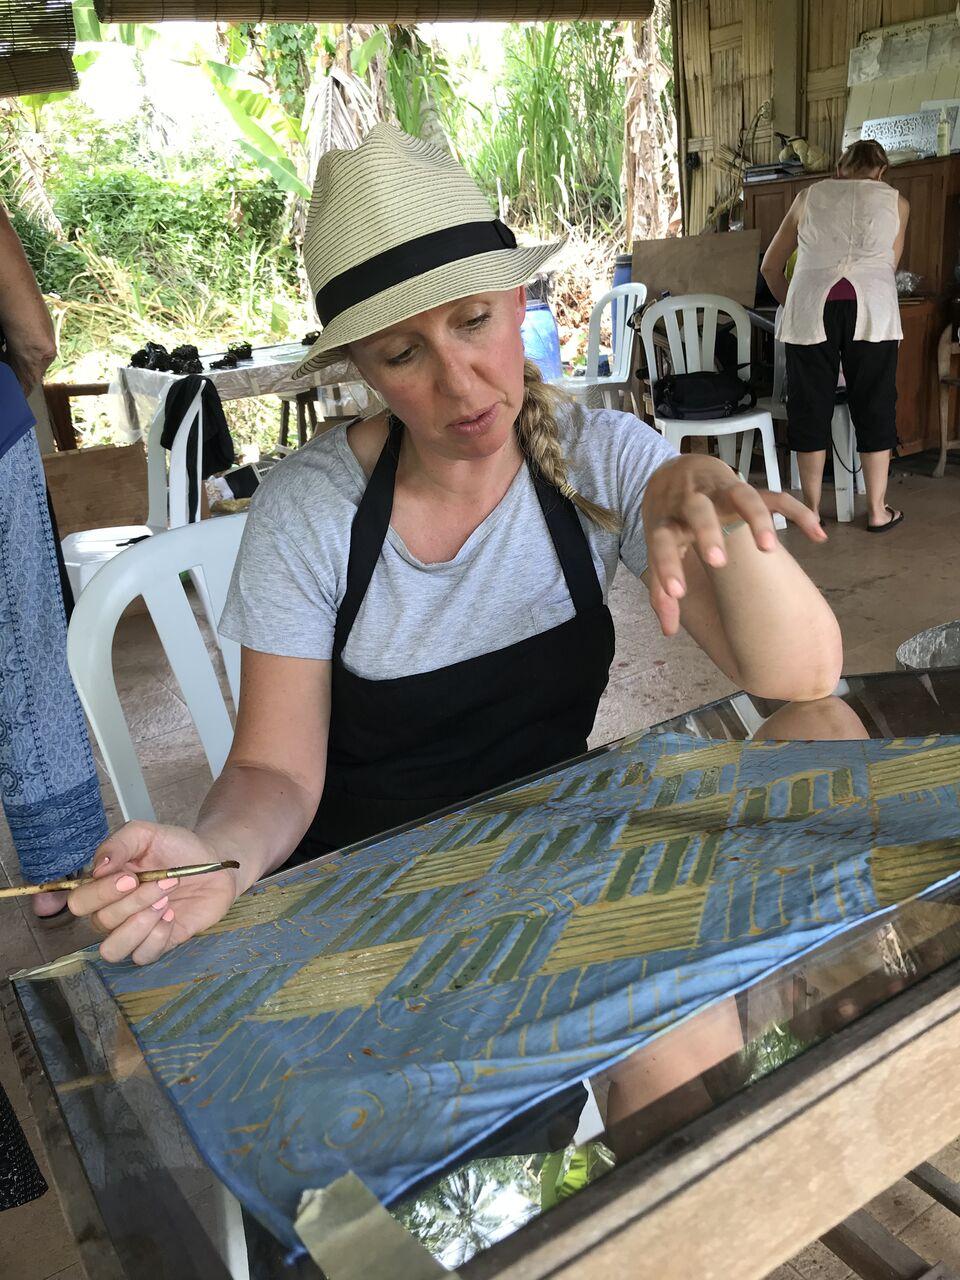 batik class | Threads of Life | give back | EAT.PRAY.MOVE Yoga Retreats | Bali